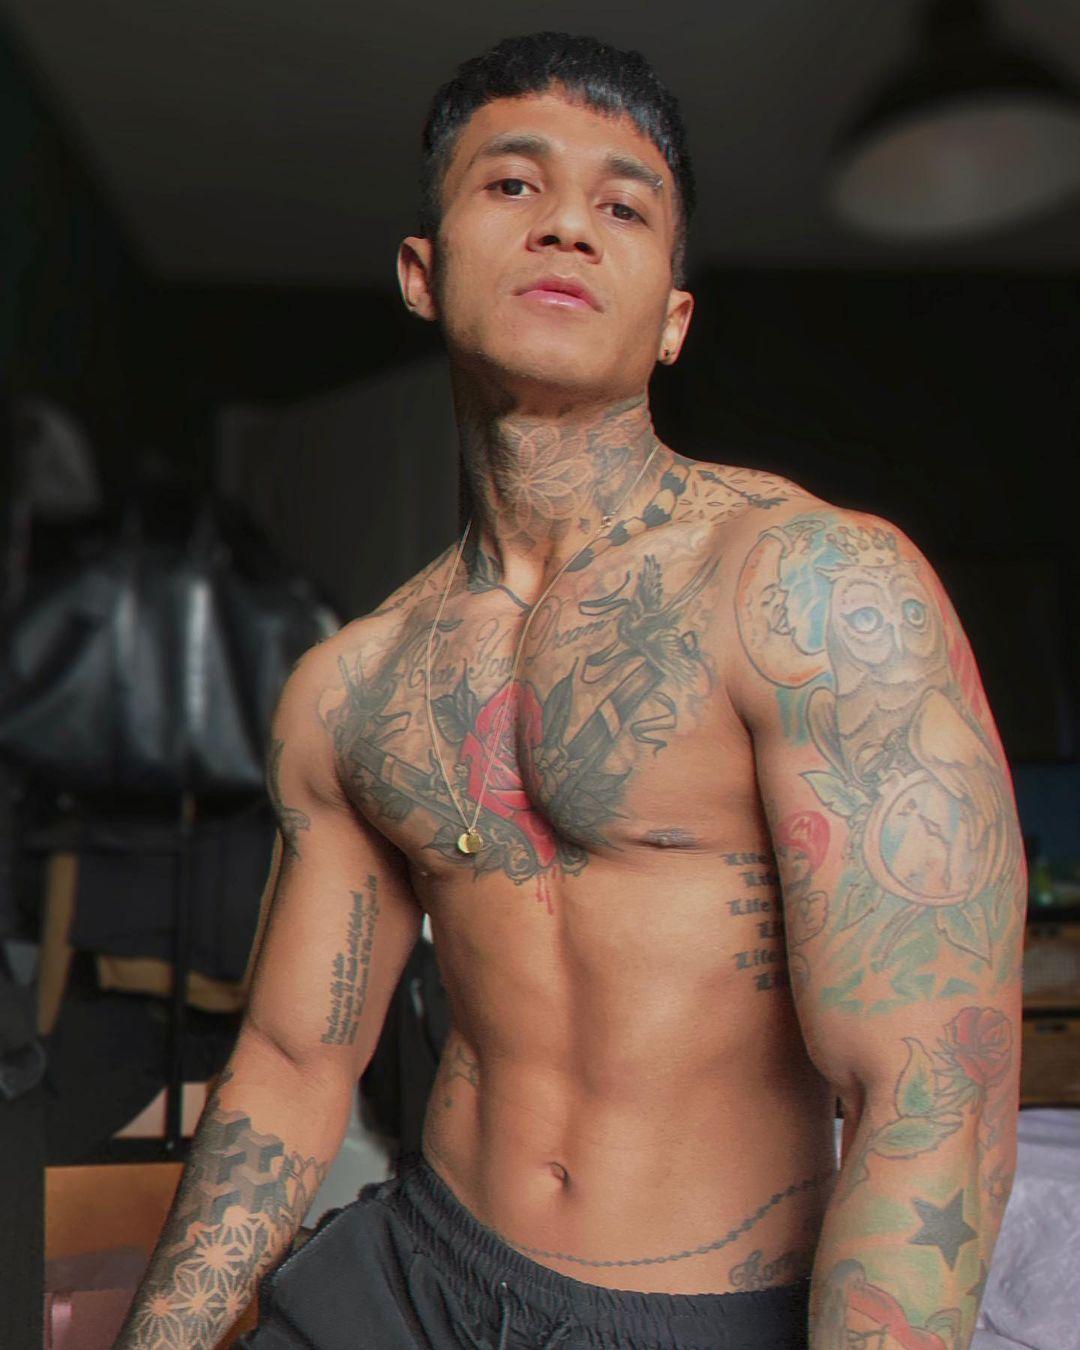 7 Fakta Fabio Toba, Bintang Porno asal Indonesia